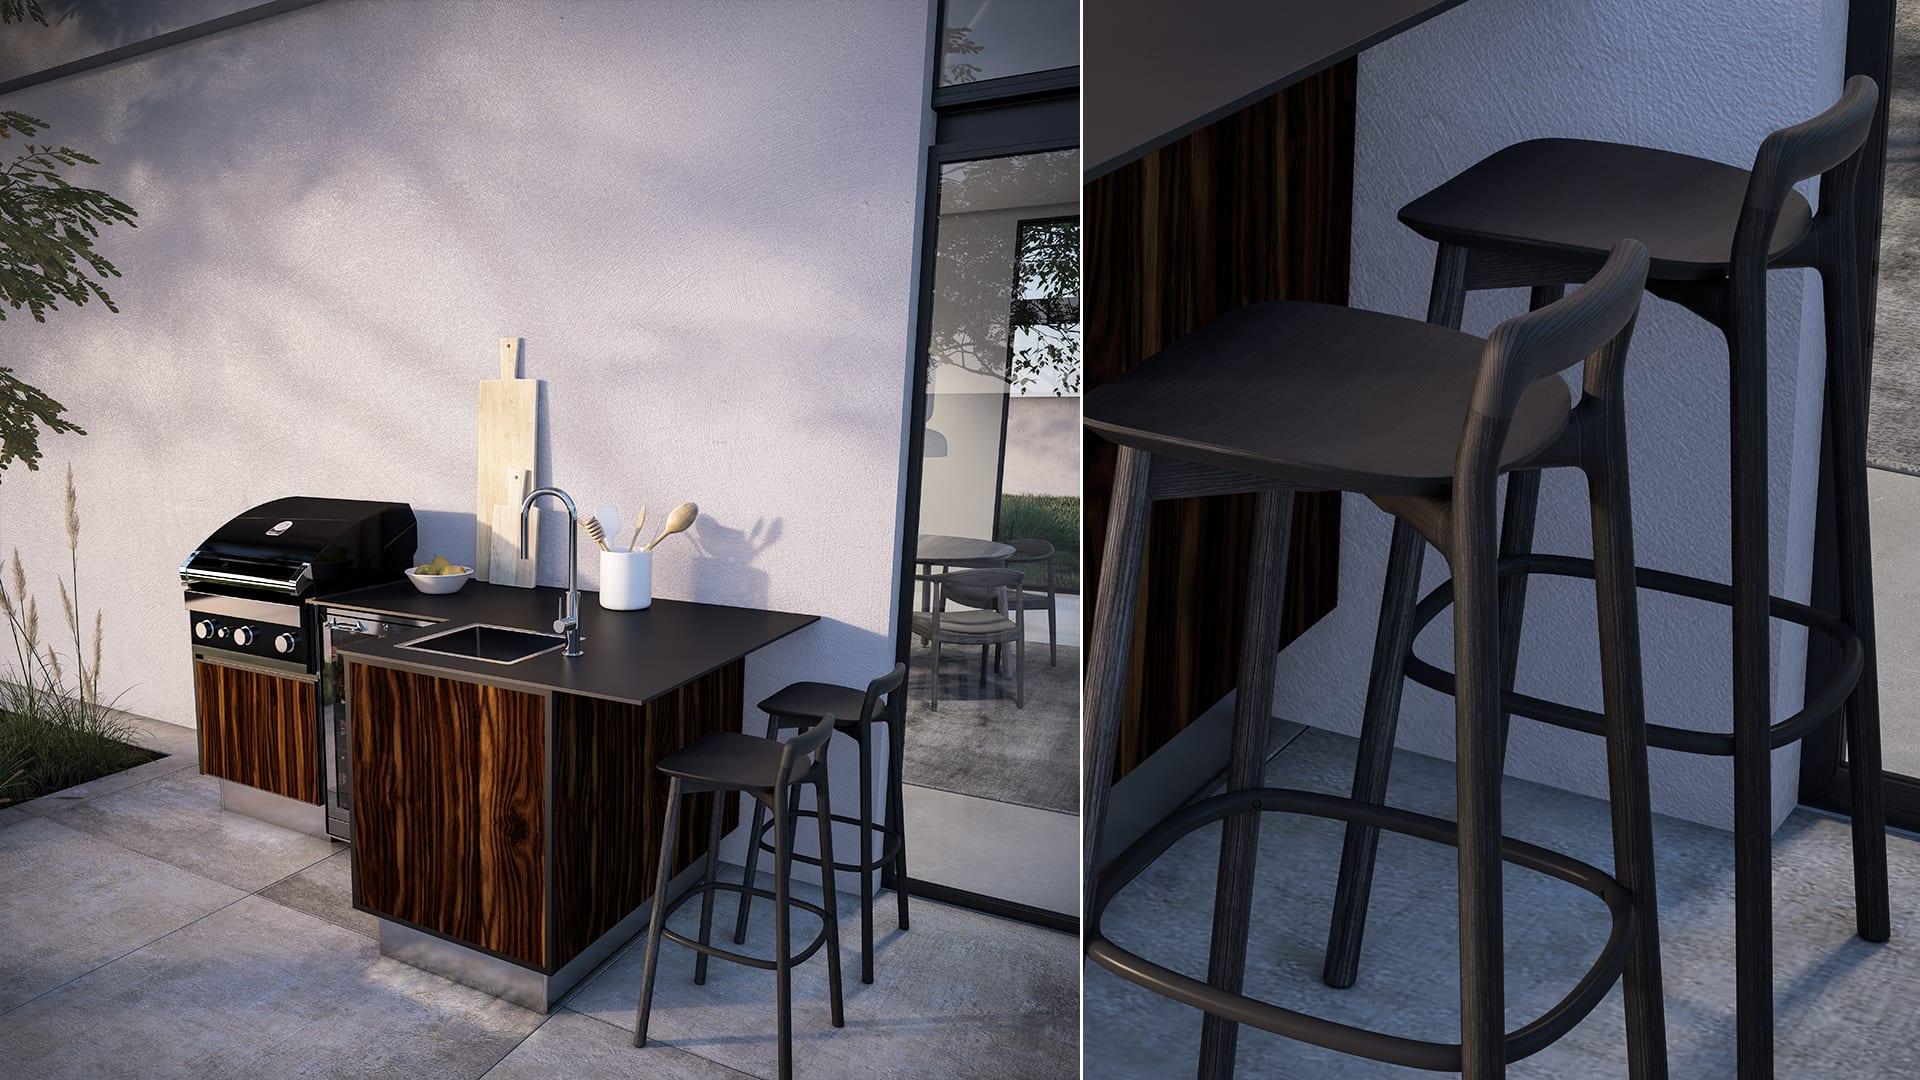 Maayan-Golan_Architectural-Visualization_product-visualization_outdoor-kitchen_alumex-by-formex_grofit-kitchen_06